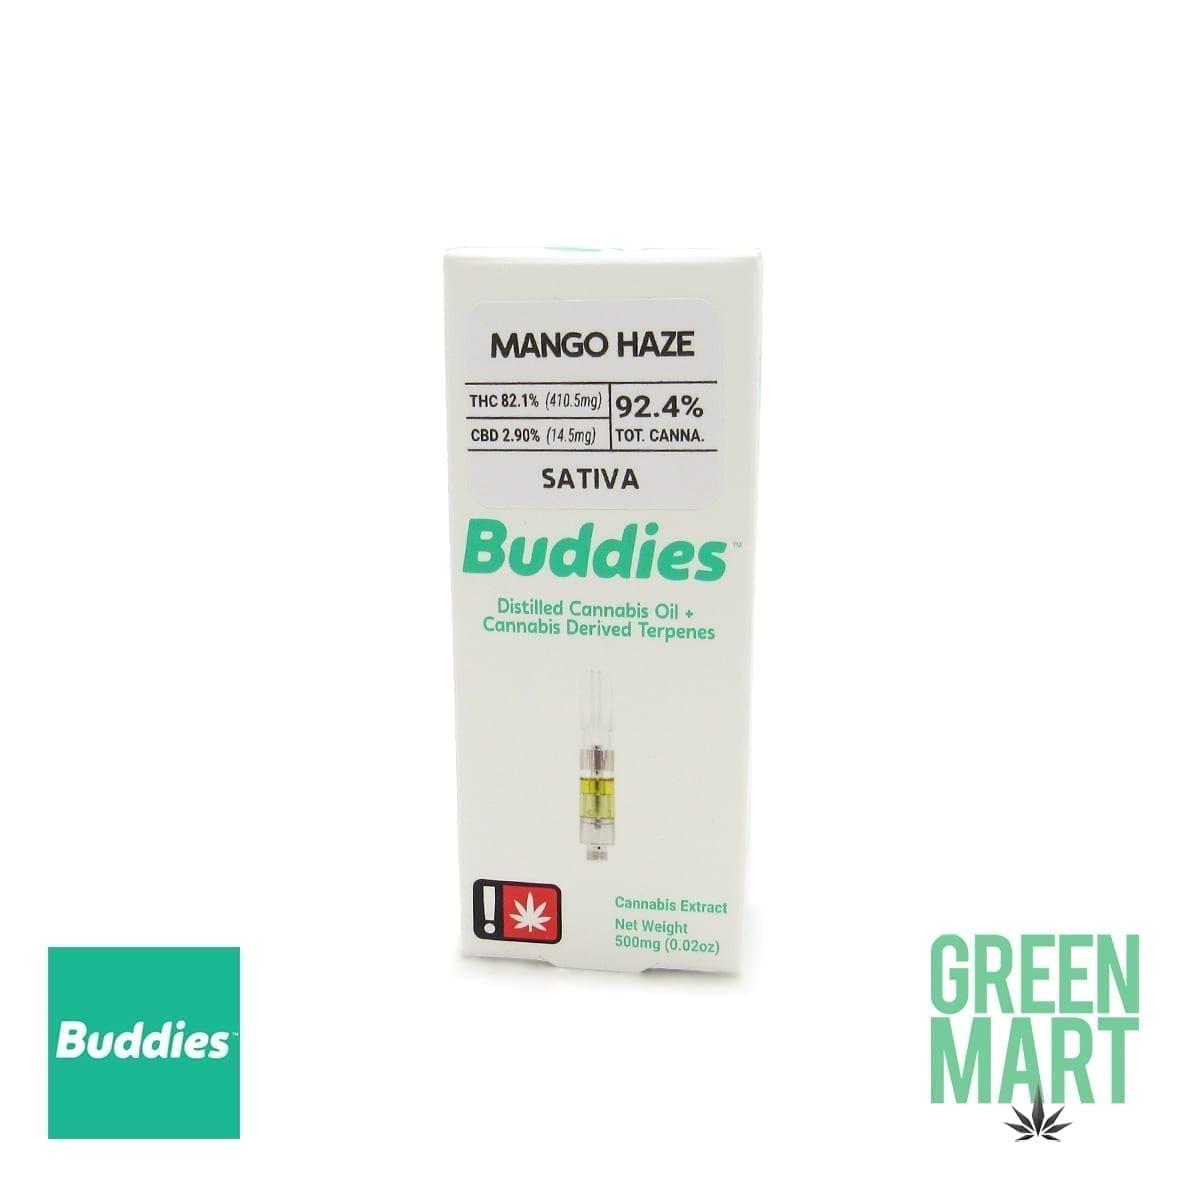 Buddies Brand Distillate Cartridge - Mango Haze